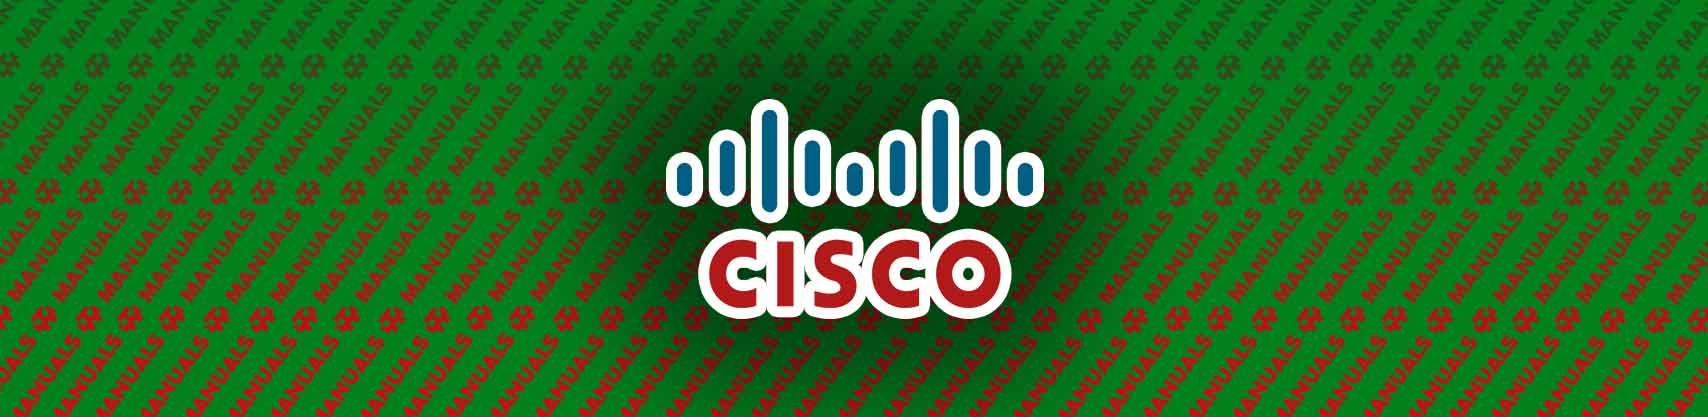 Cisco ASA-5505 Manual